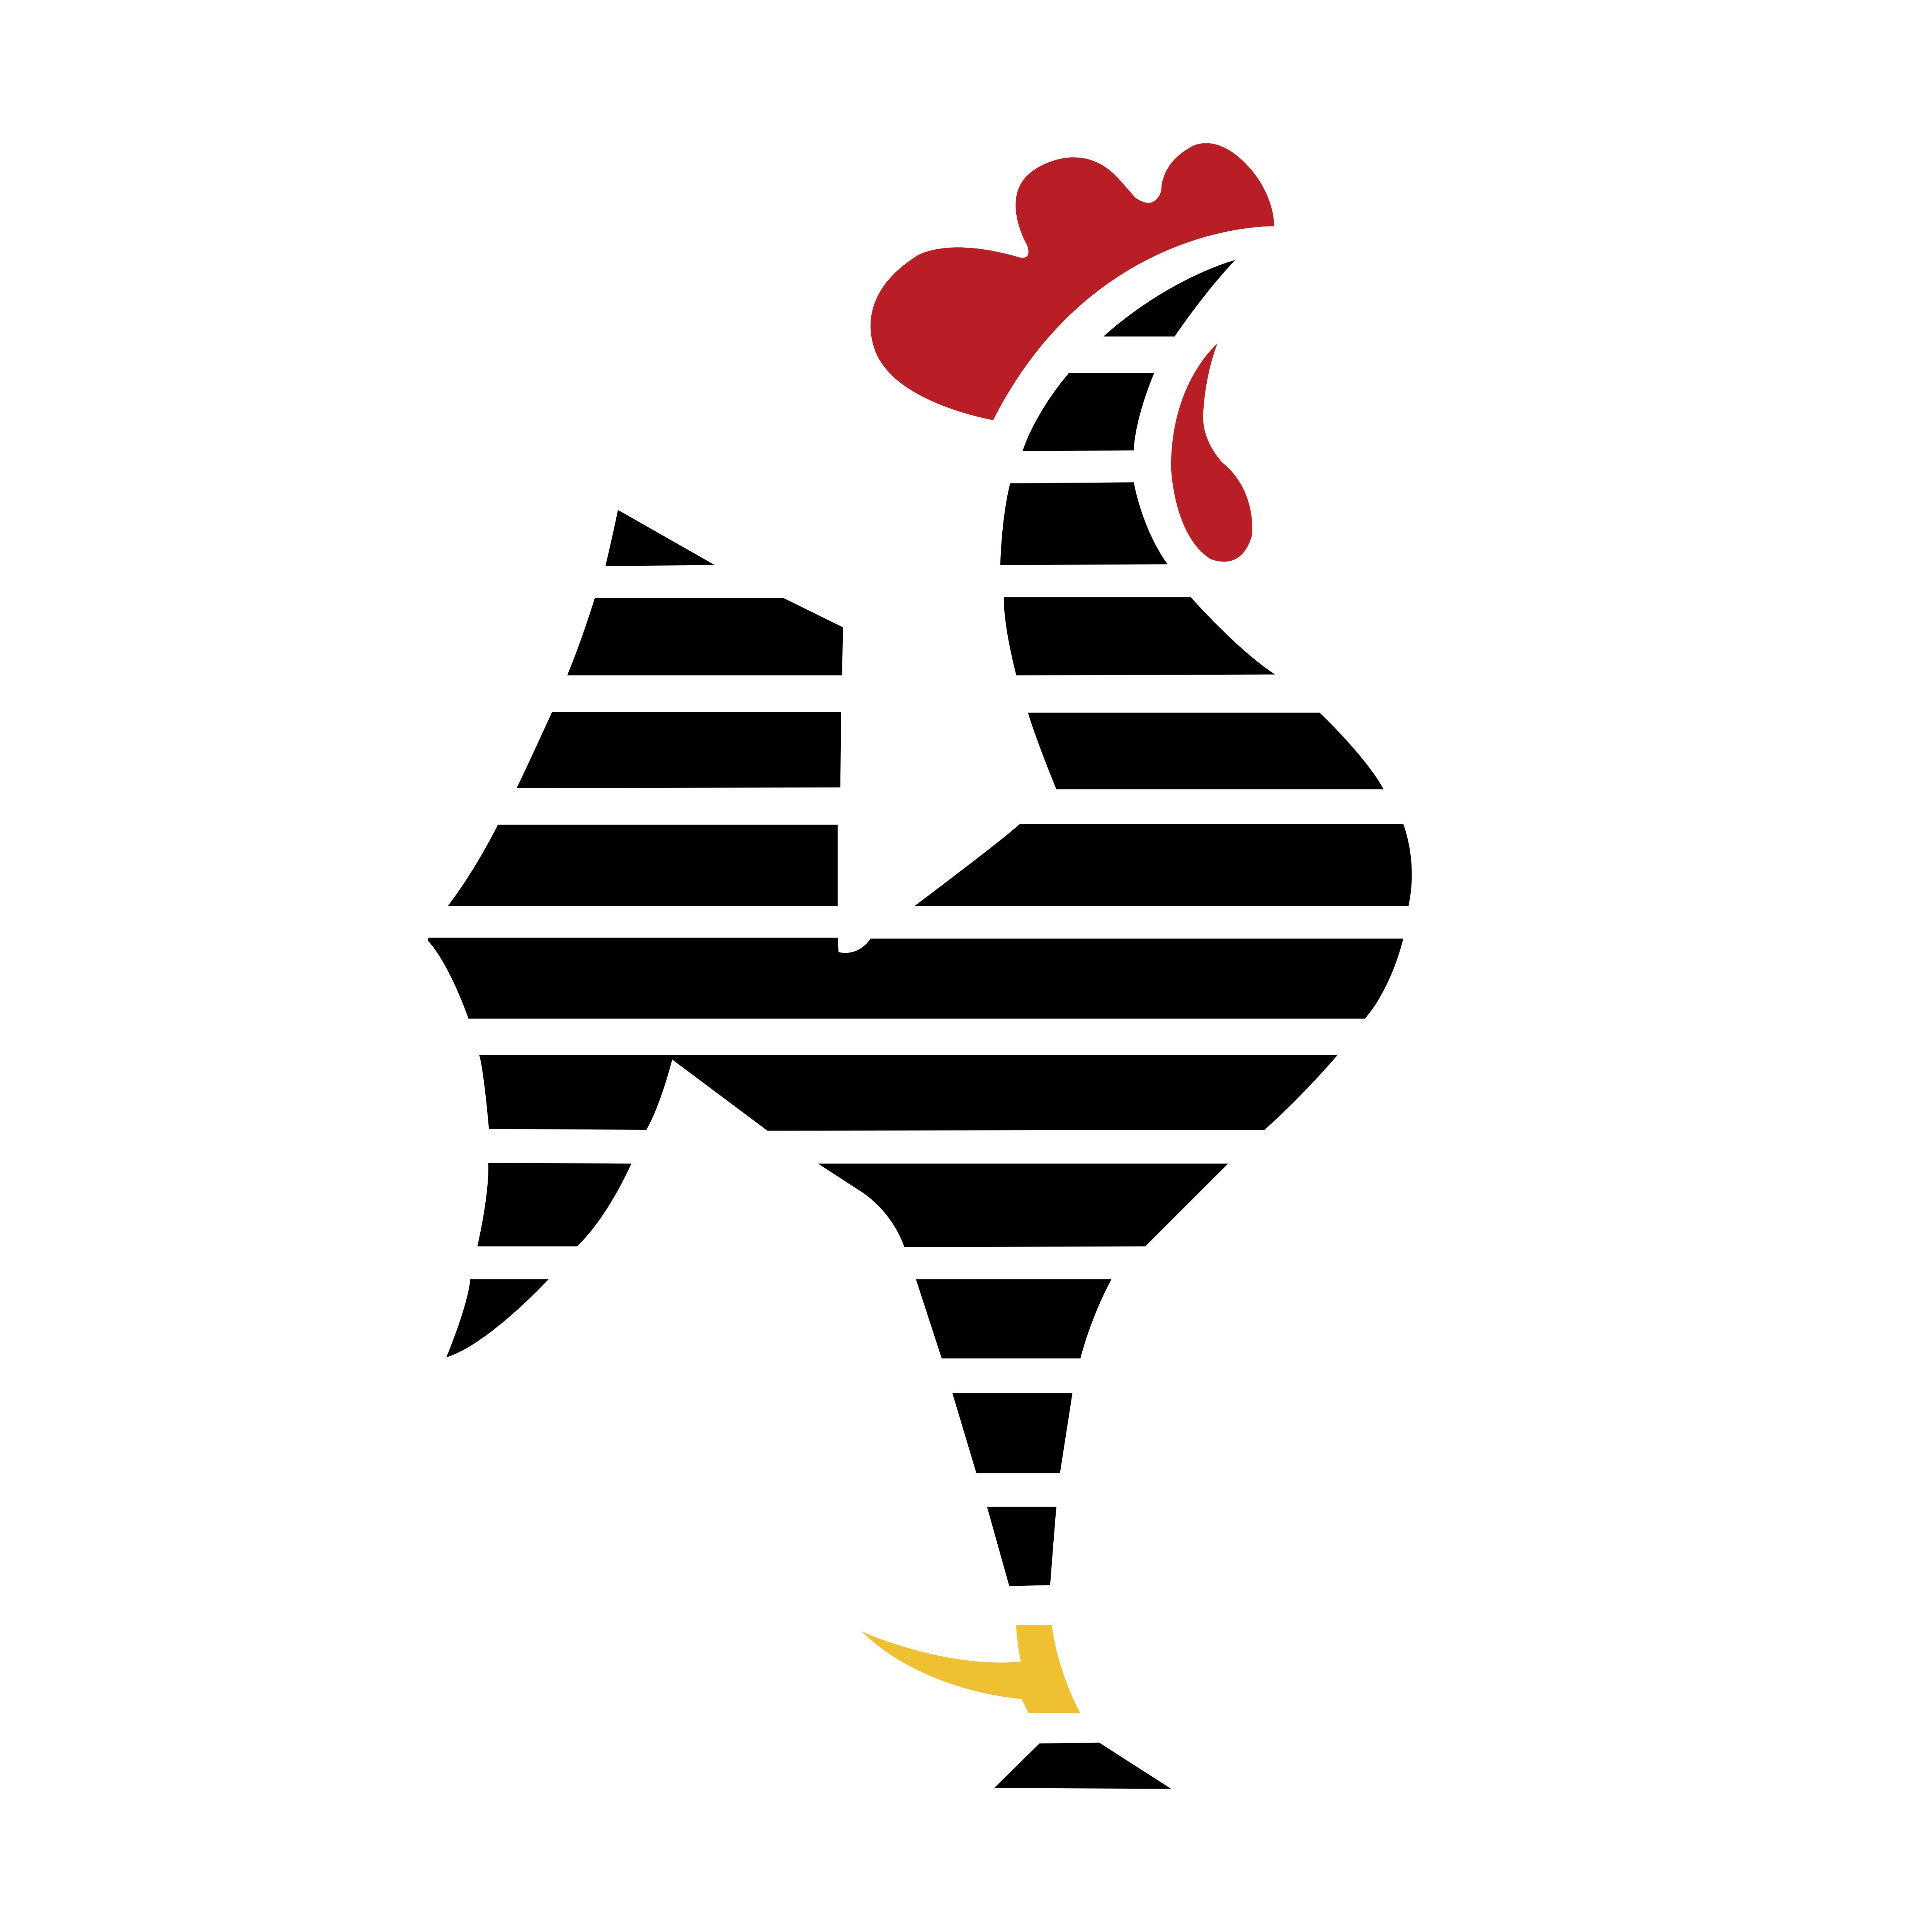 Clube Atletico Mineiro U2013 Logos Download